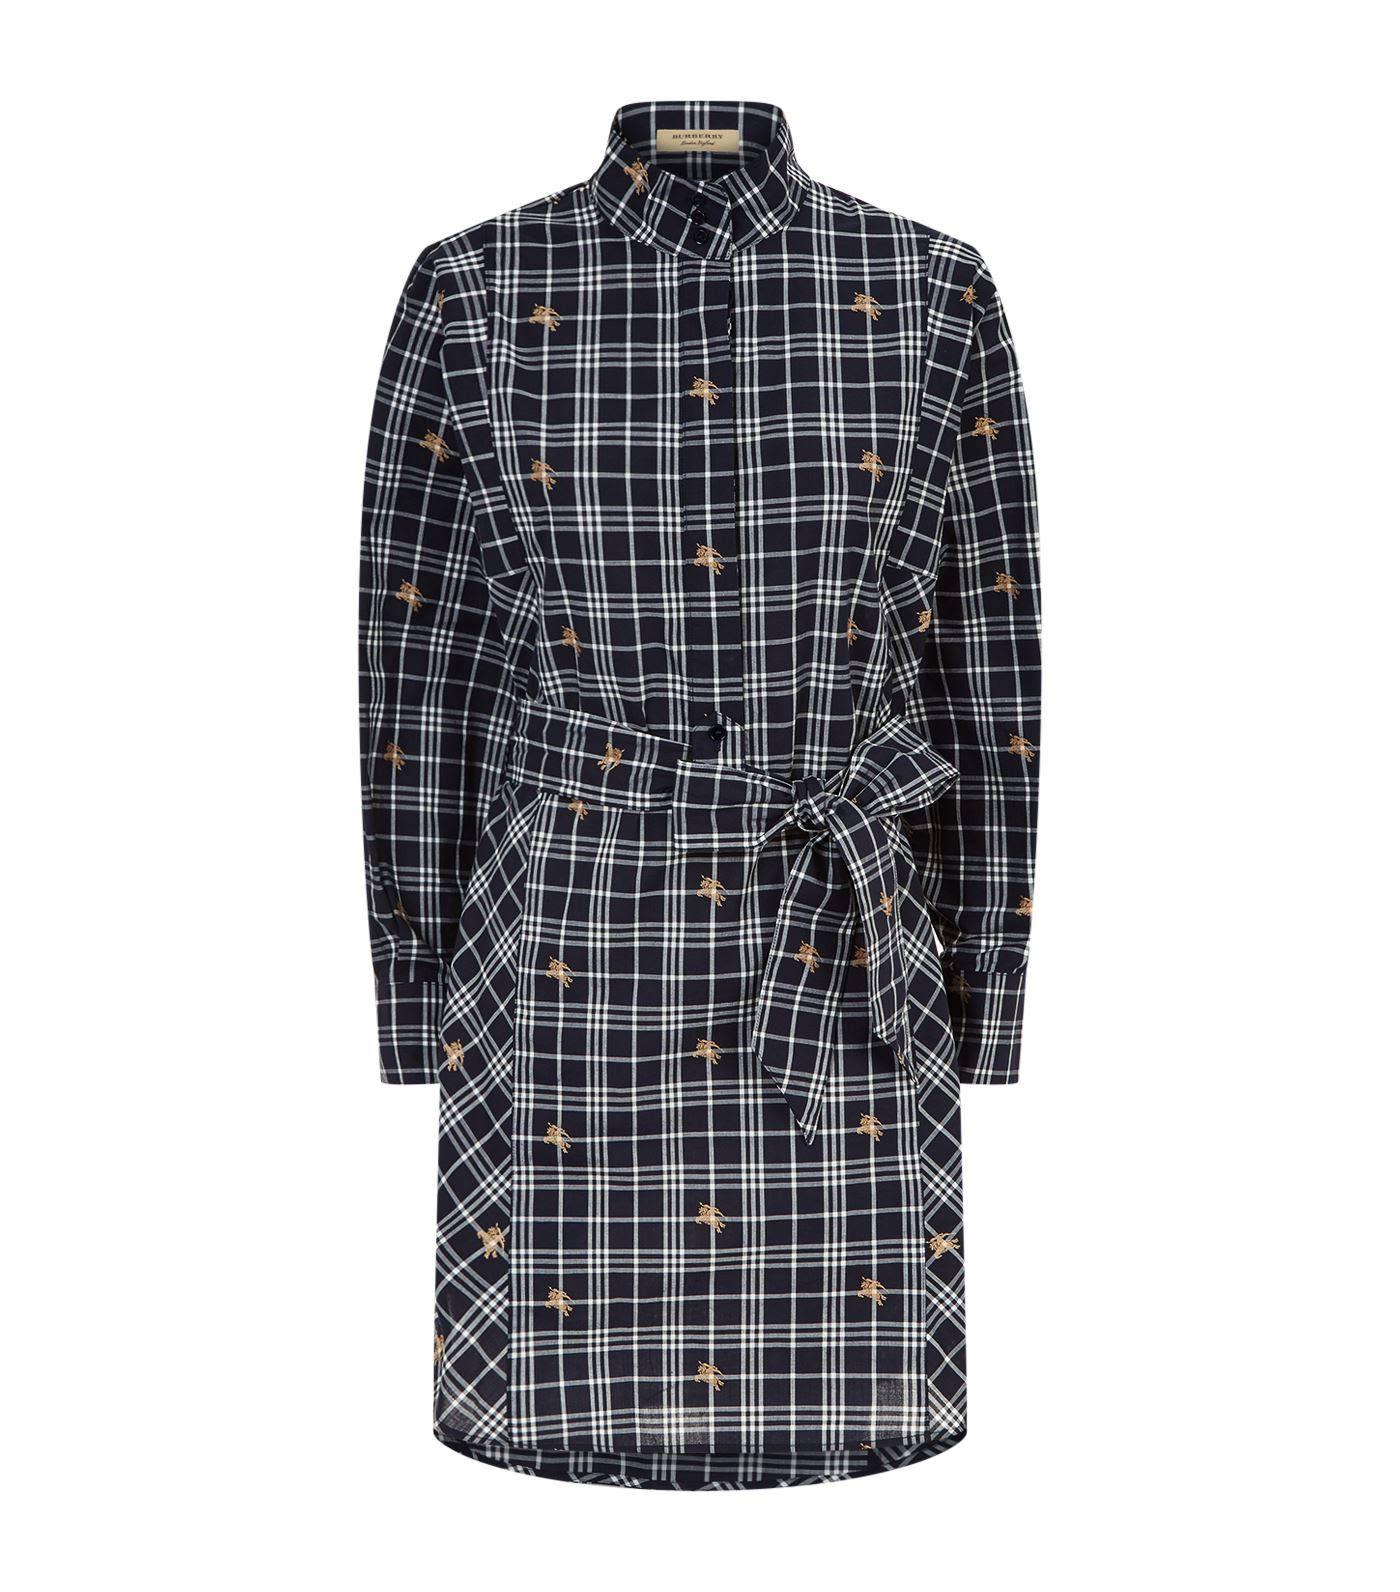 Dress Blue Shirt Burberry Dress Check Burberry Shirt Check 5RA4jL